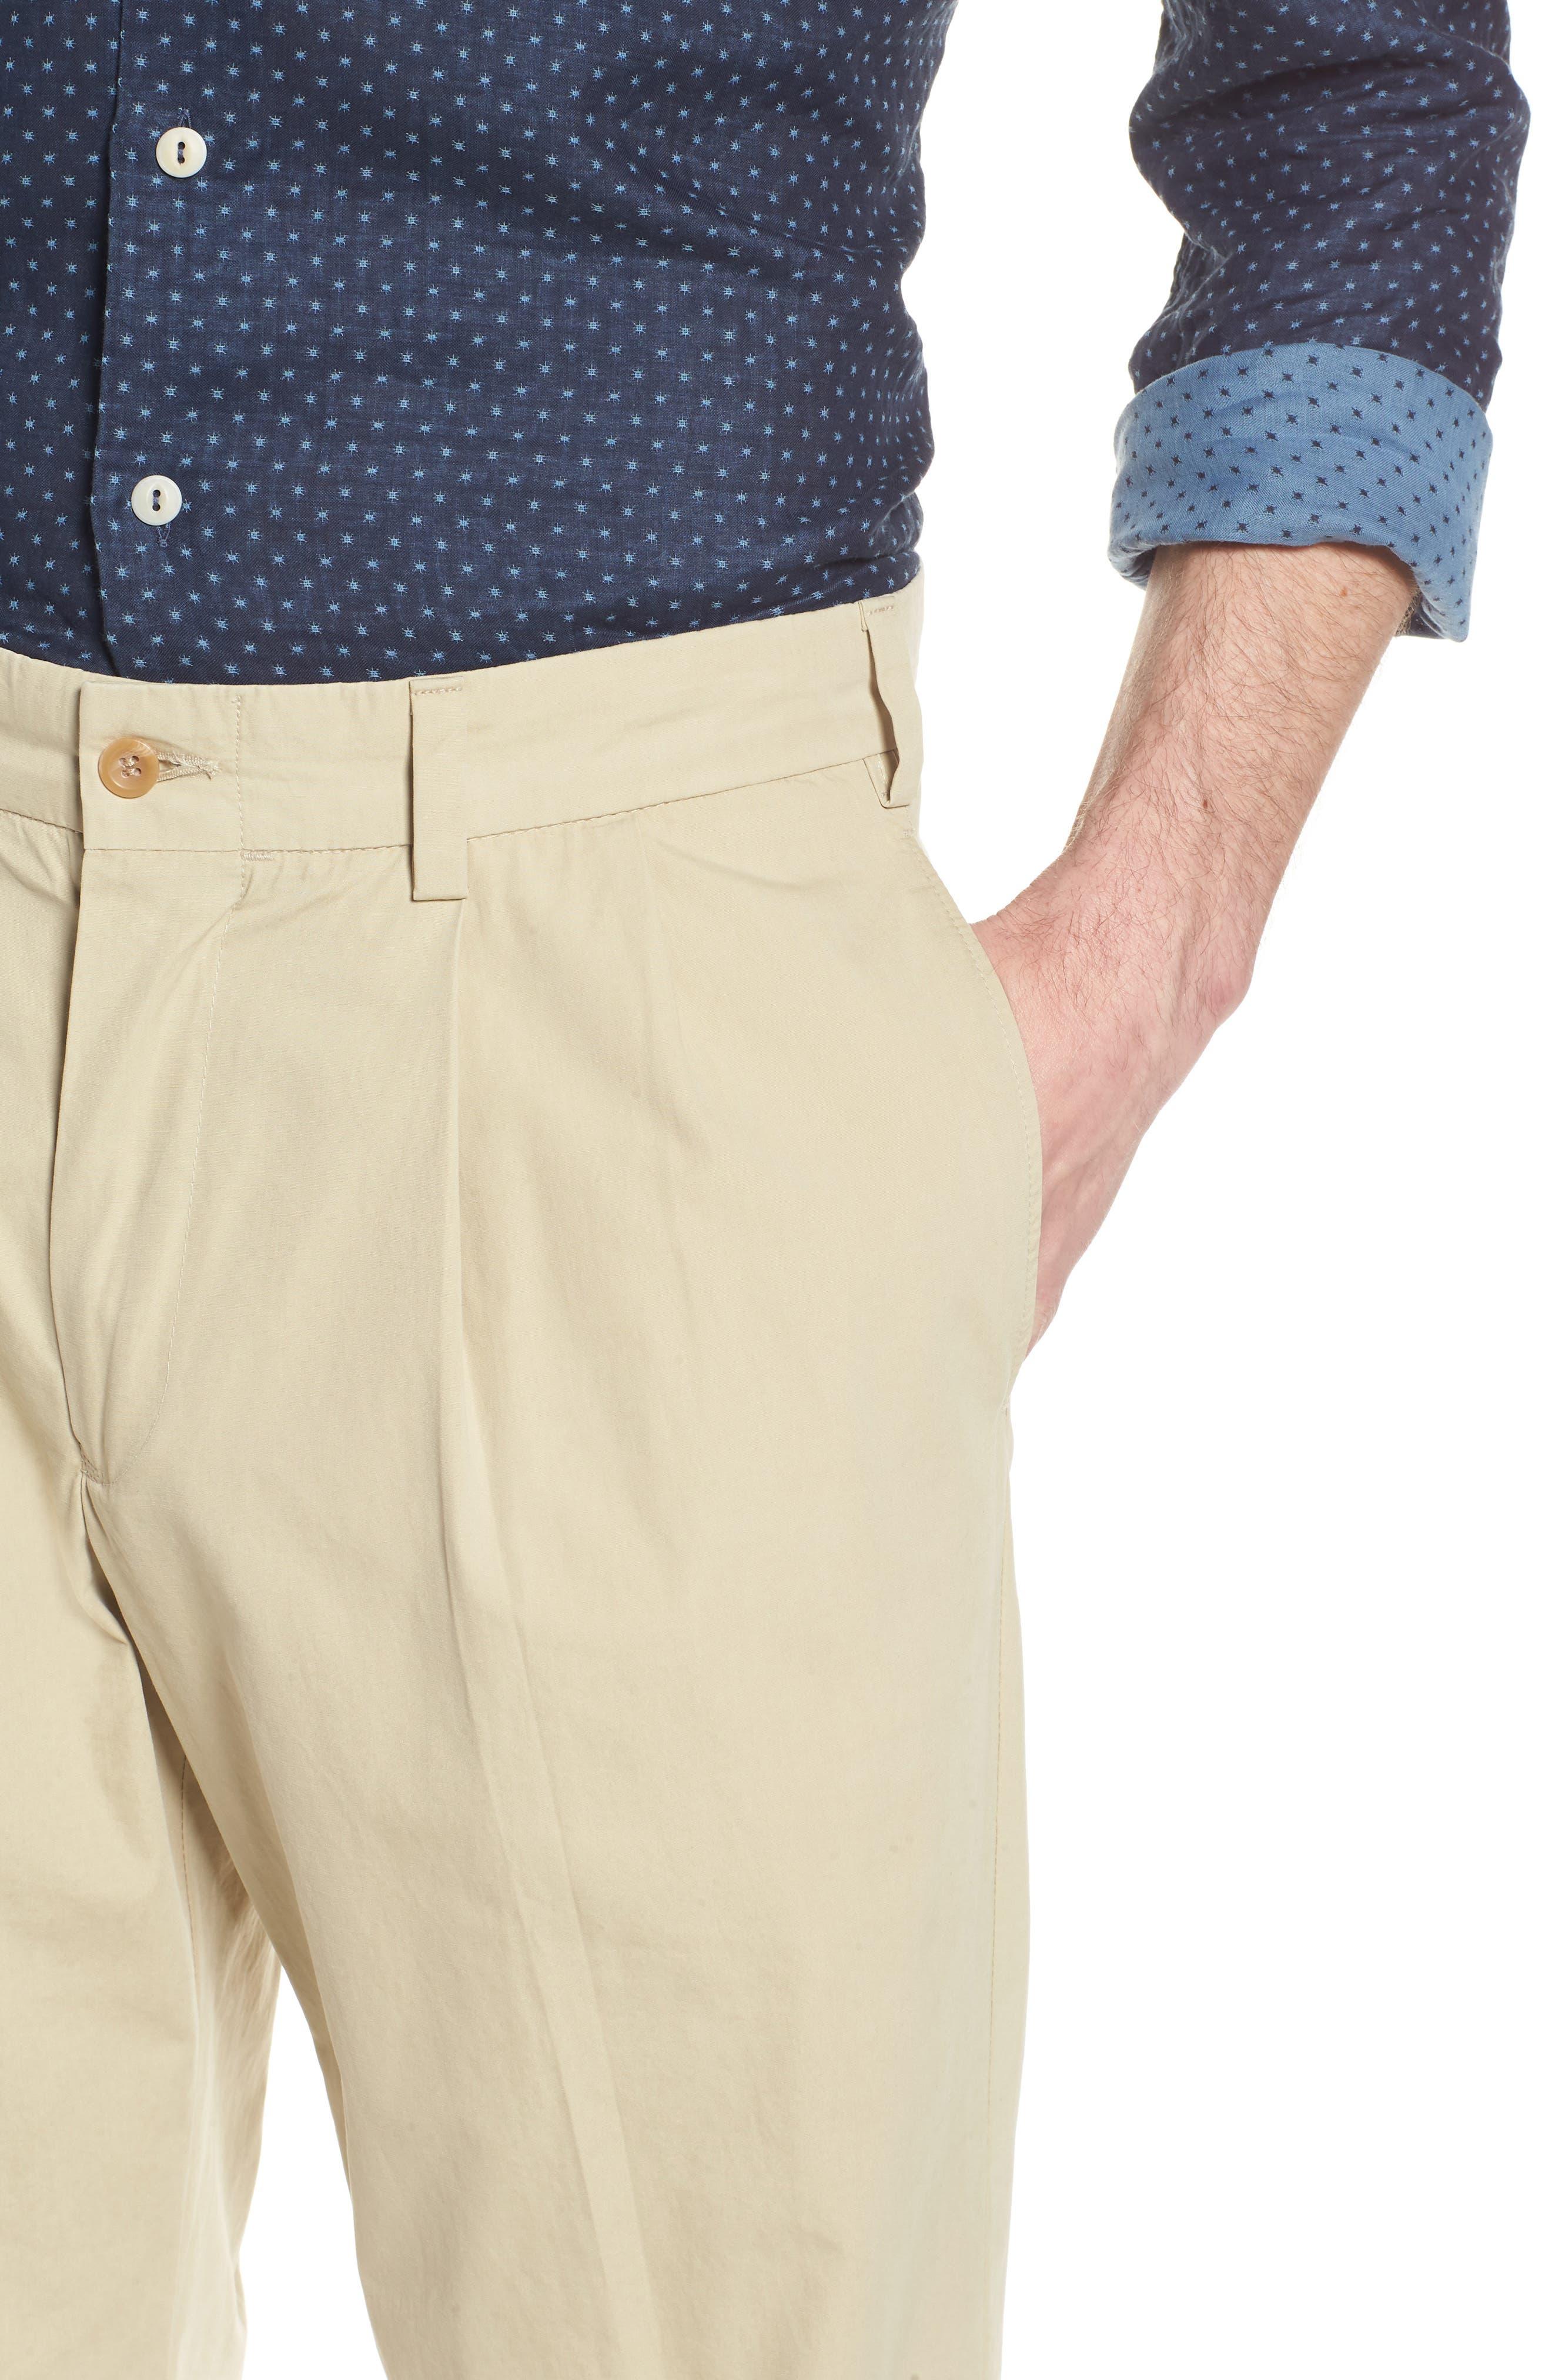 M2 Classic Fit Pleated Tropical Cotton Poplin Pants,                             Alternate thumbnail 4, color,                             Khaki